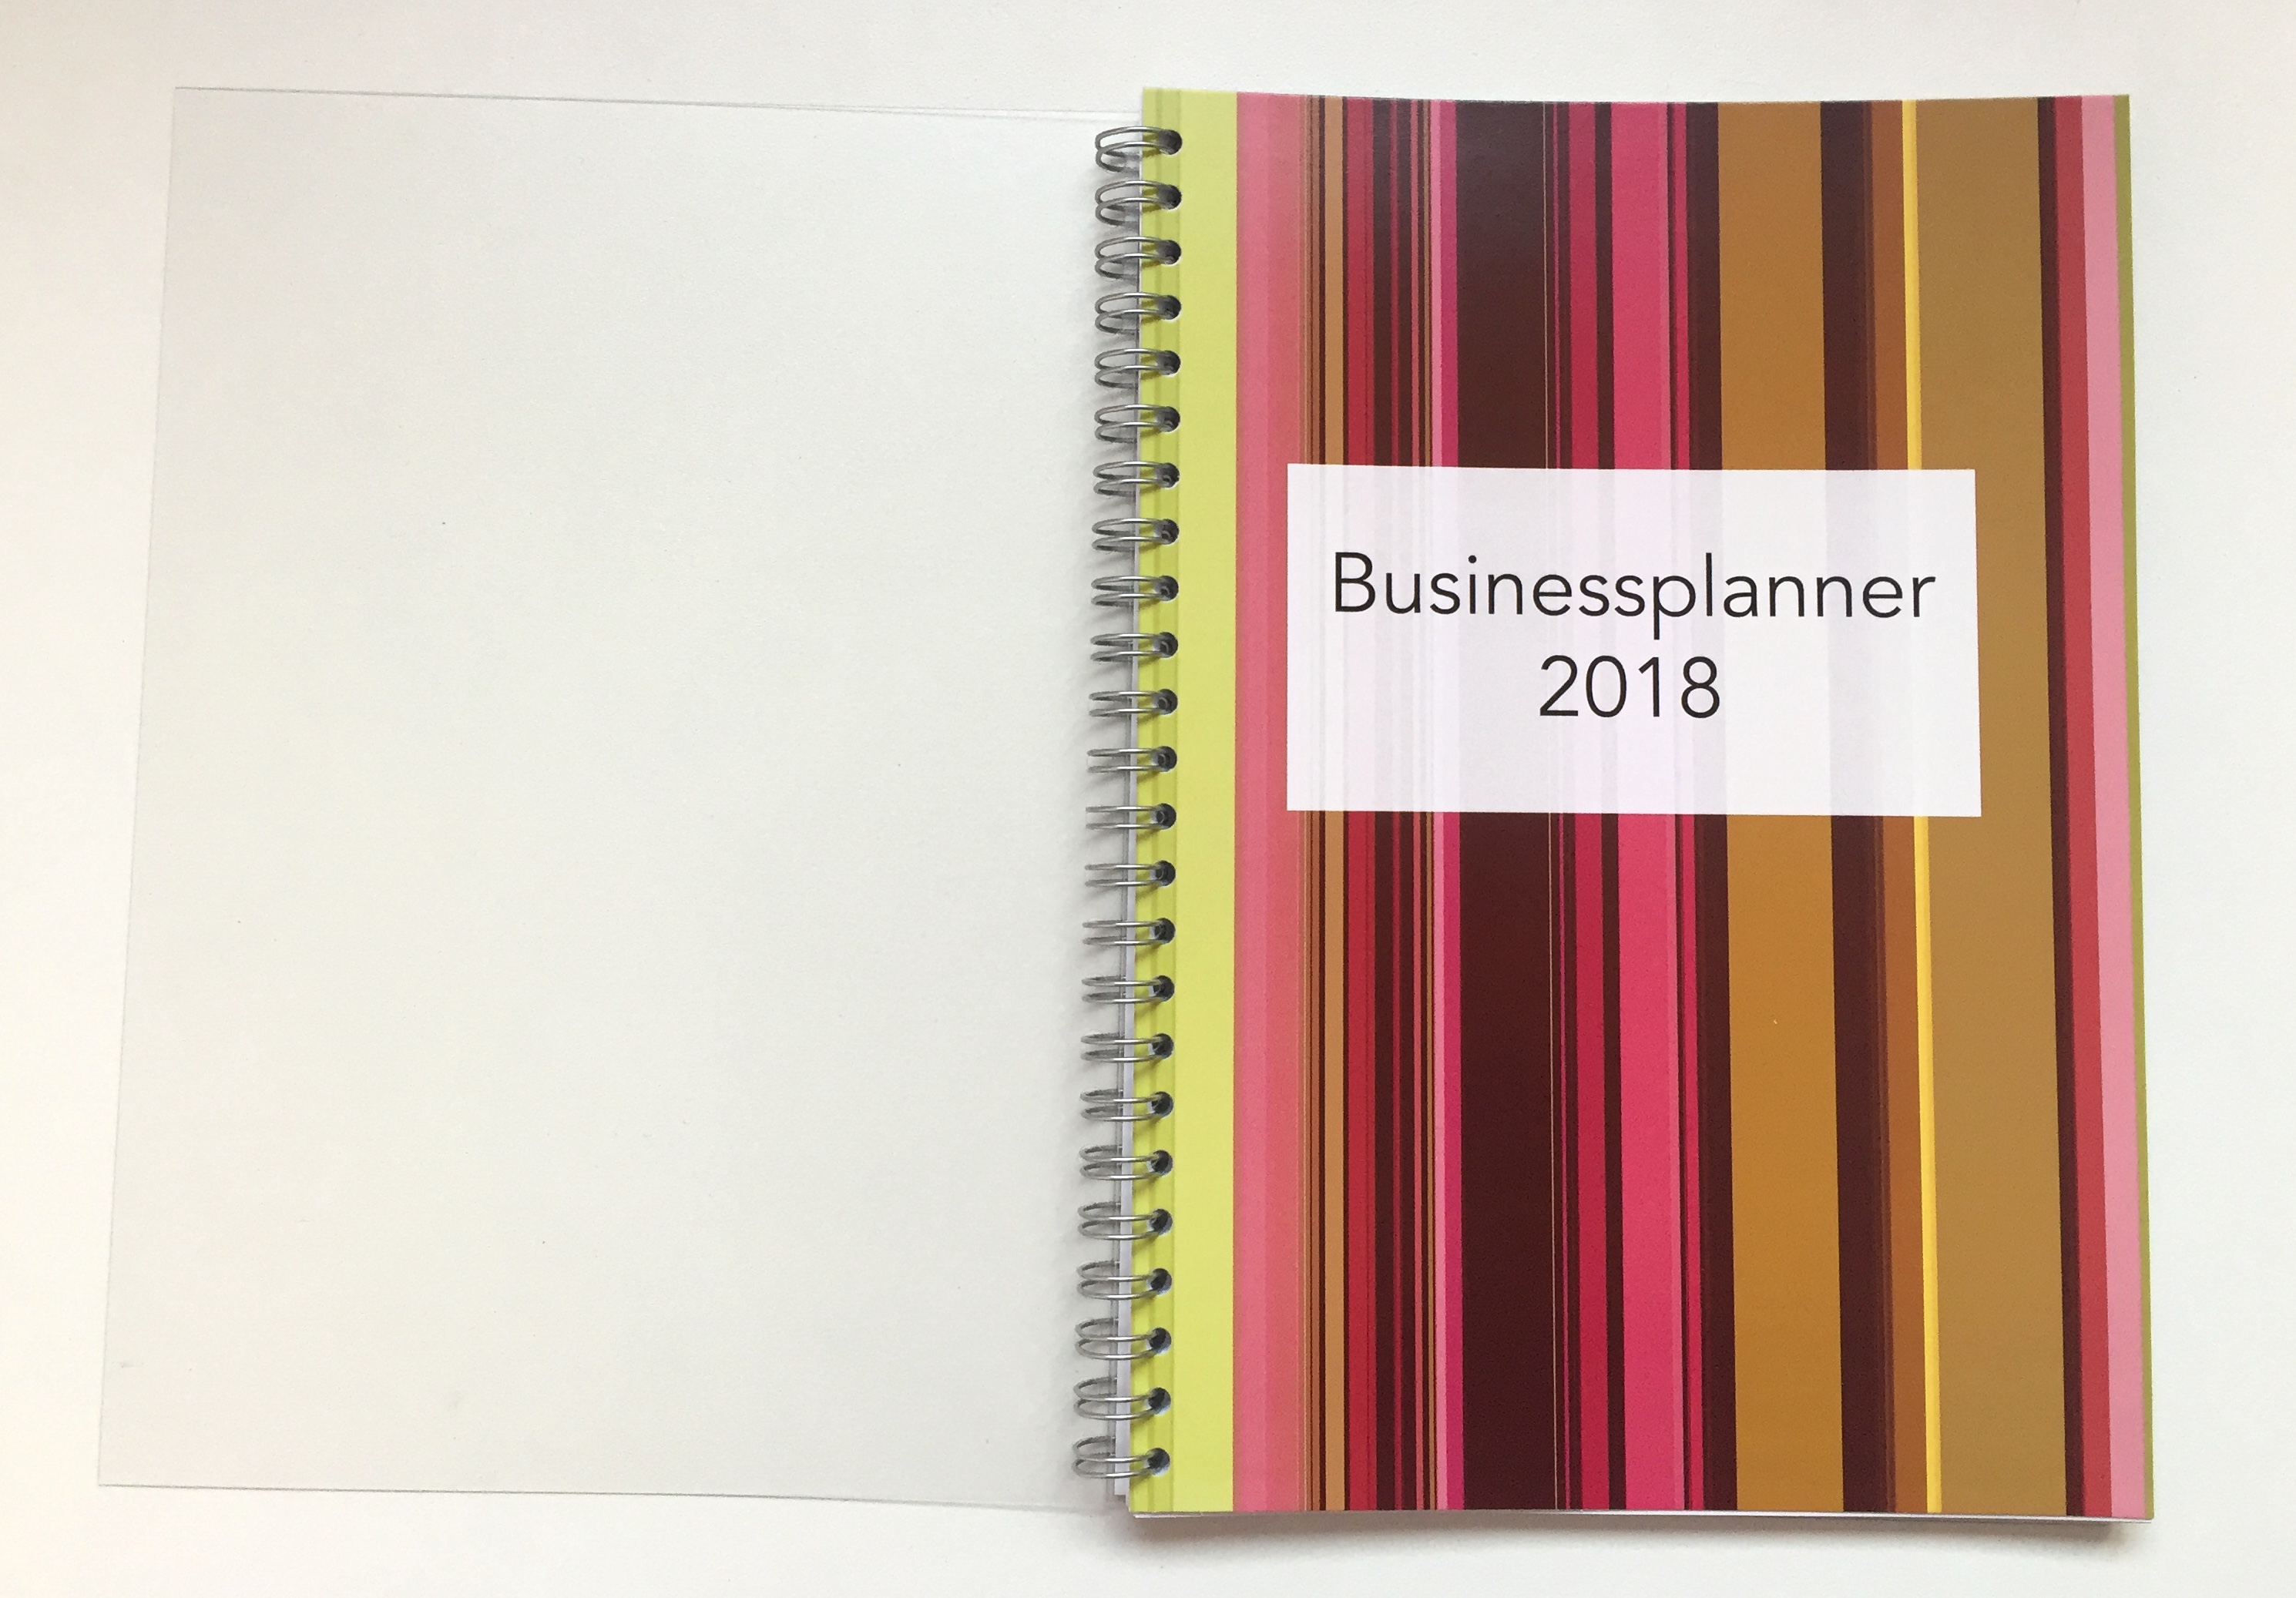 Businessplanner 2018 Open